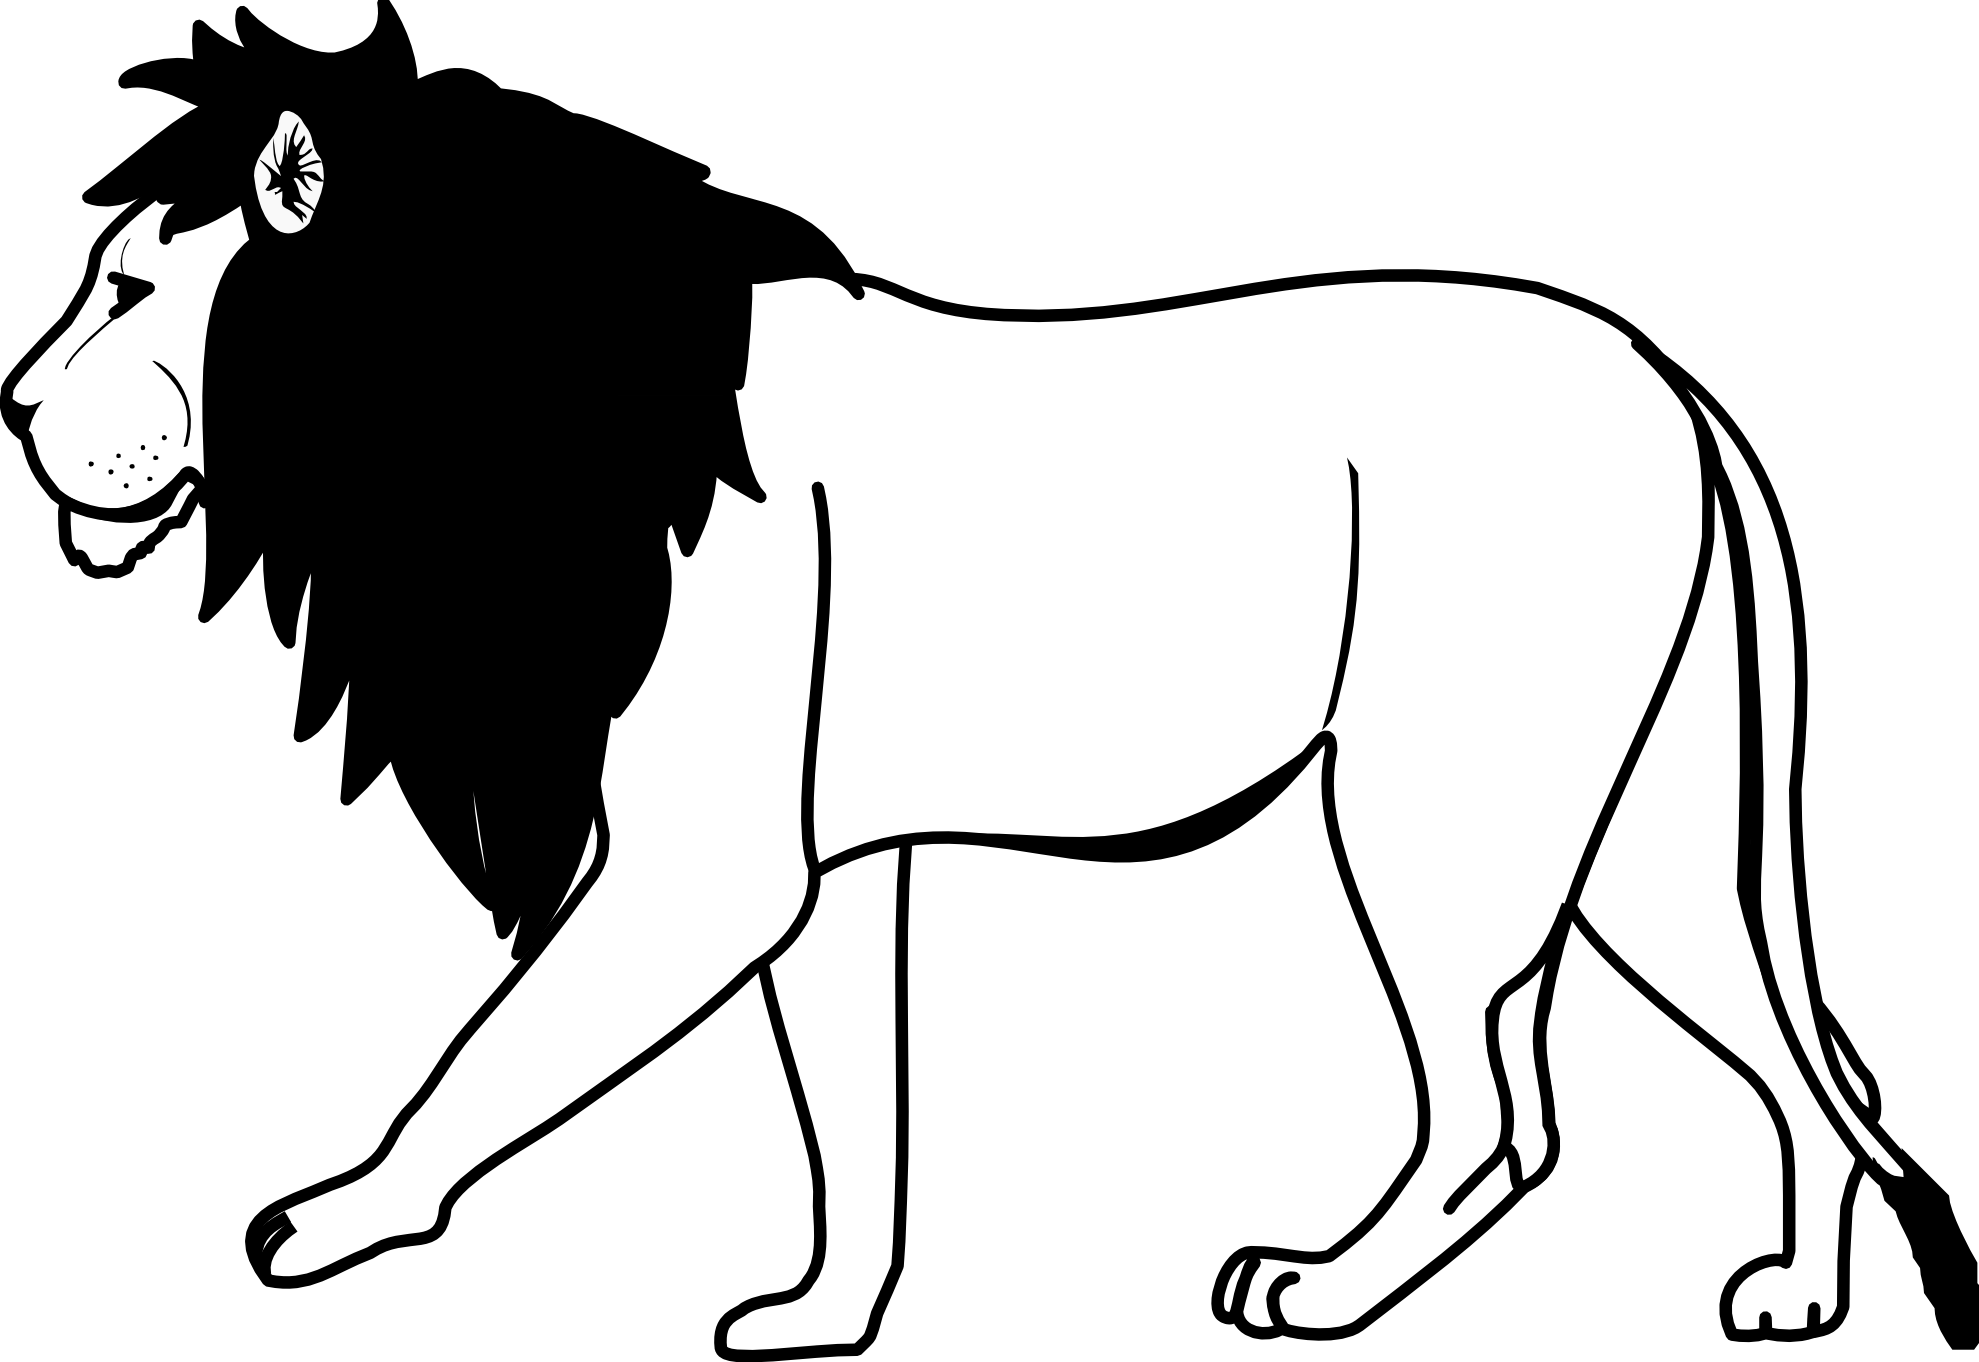 Picture clipart lion. Clip art black and